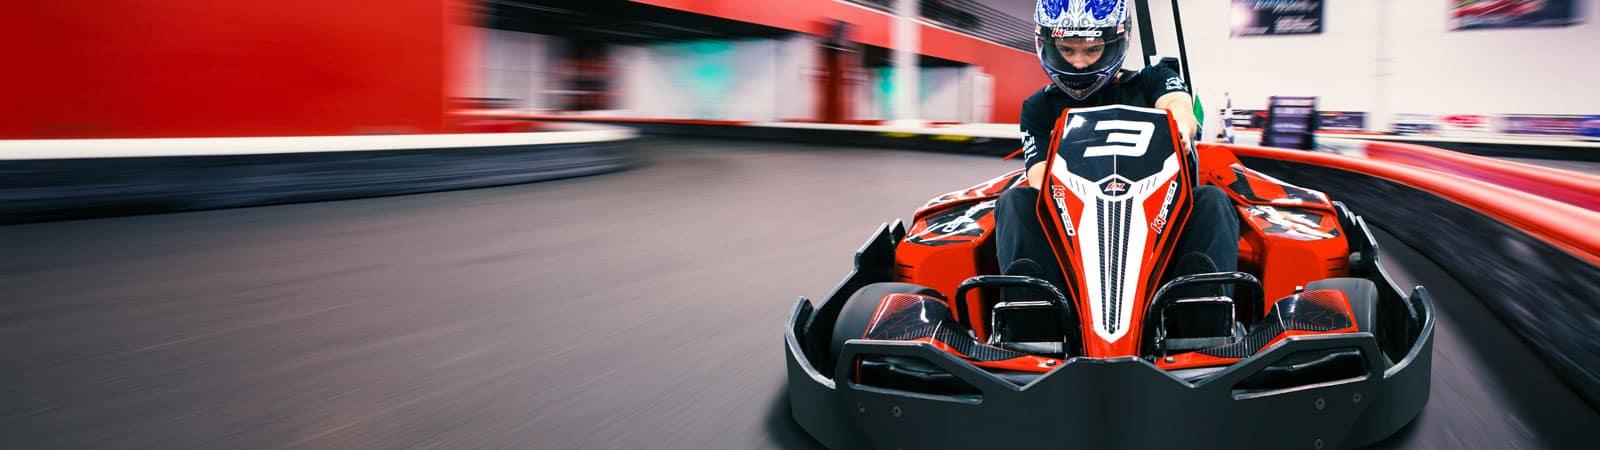 Go Kart Racing Houston >> K1 Speed | Fort Lauderdale Location